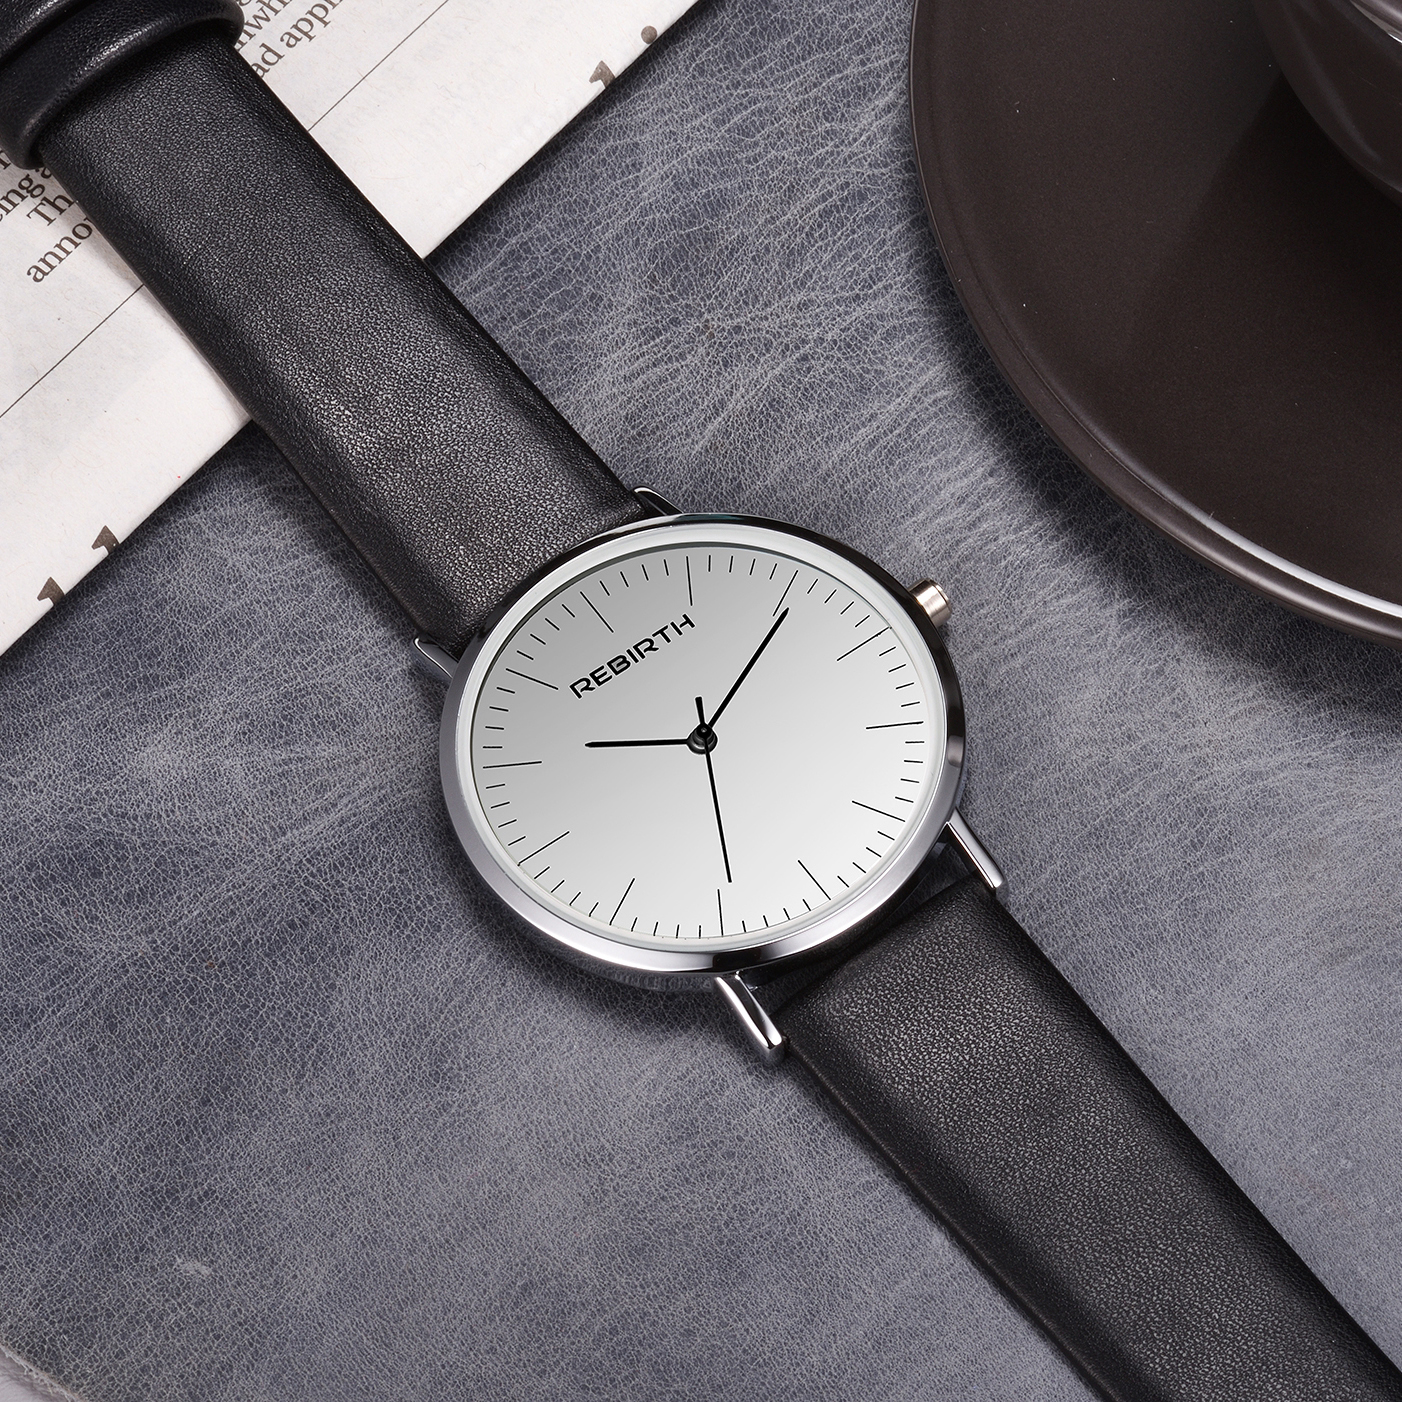 Hot Fashion Quality Vintage Classic Unisex Quartz Wristwatch Elegant Simple Leather Strap Watch Men Women Casual Style Watch